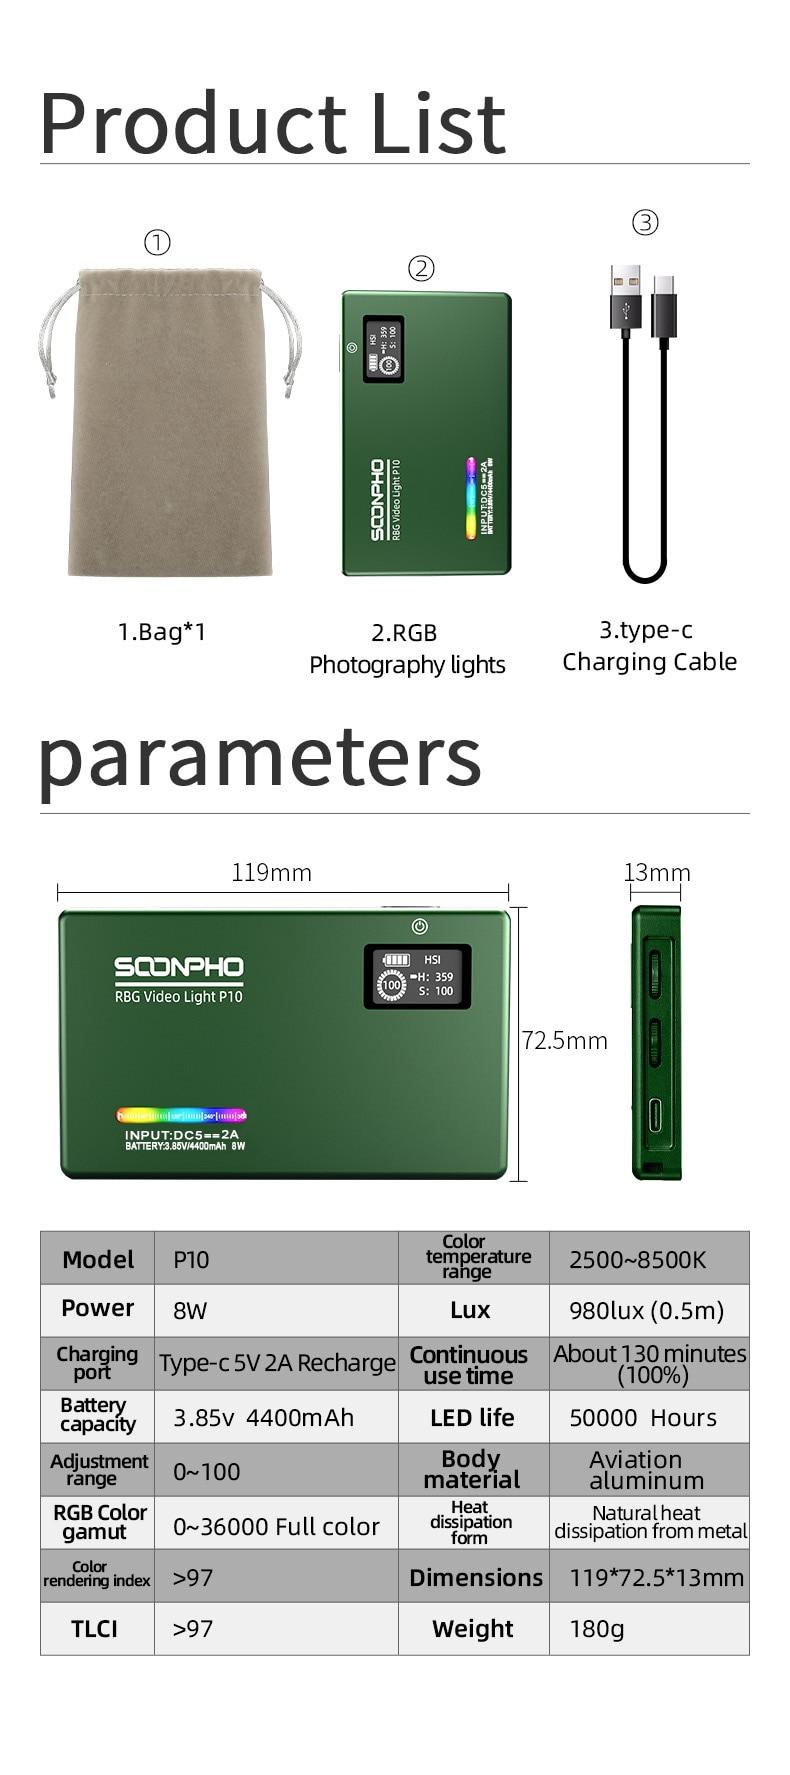 H07014fc6a82947b085ccbb85daa64bf8P soonpho RGB LED Camera Light Full Color Output Video Light Kit Dimmable 2500K-8500K Bi-Color Panel Light CRI 95+